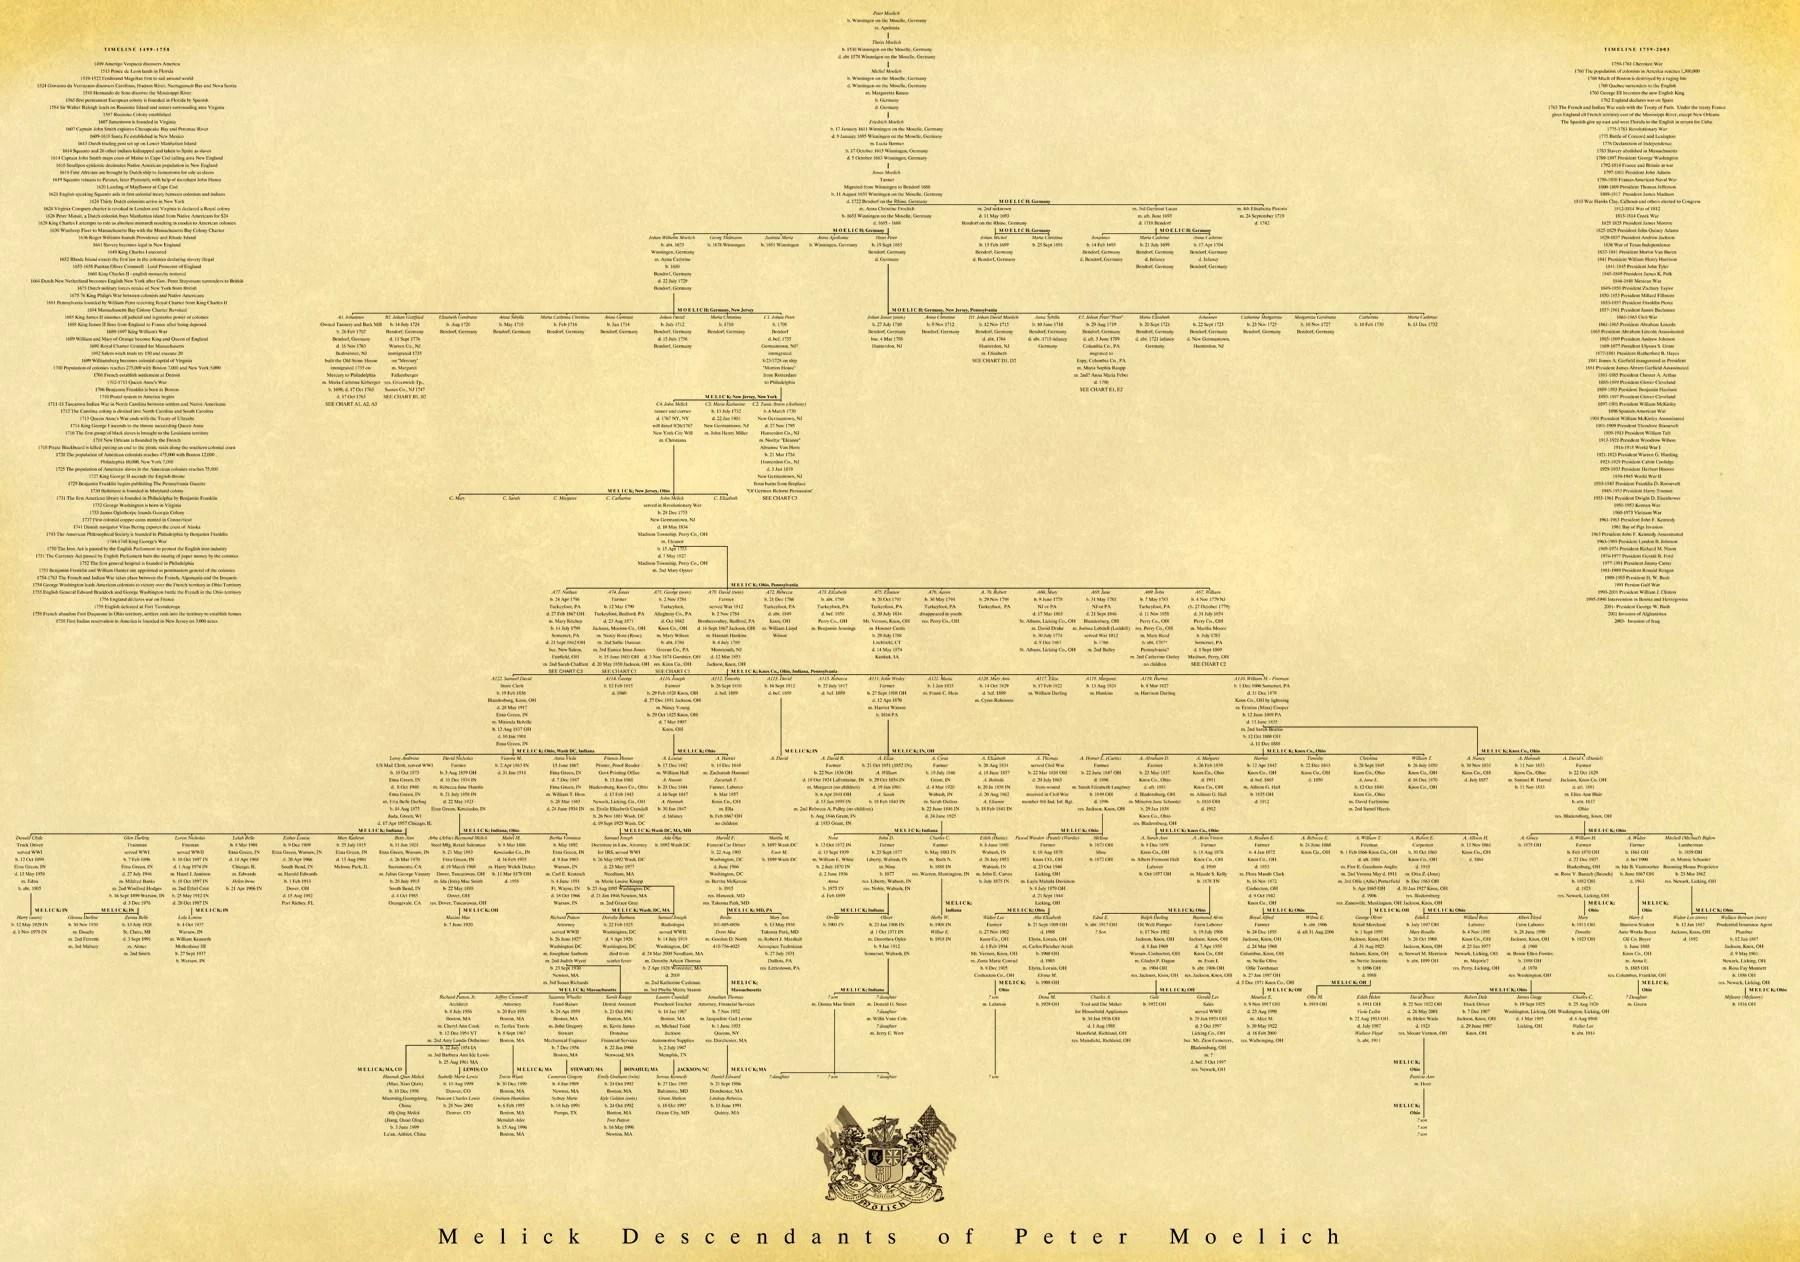 Professional Genealogy Charts Amp Family Trees